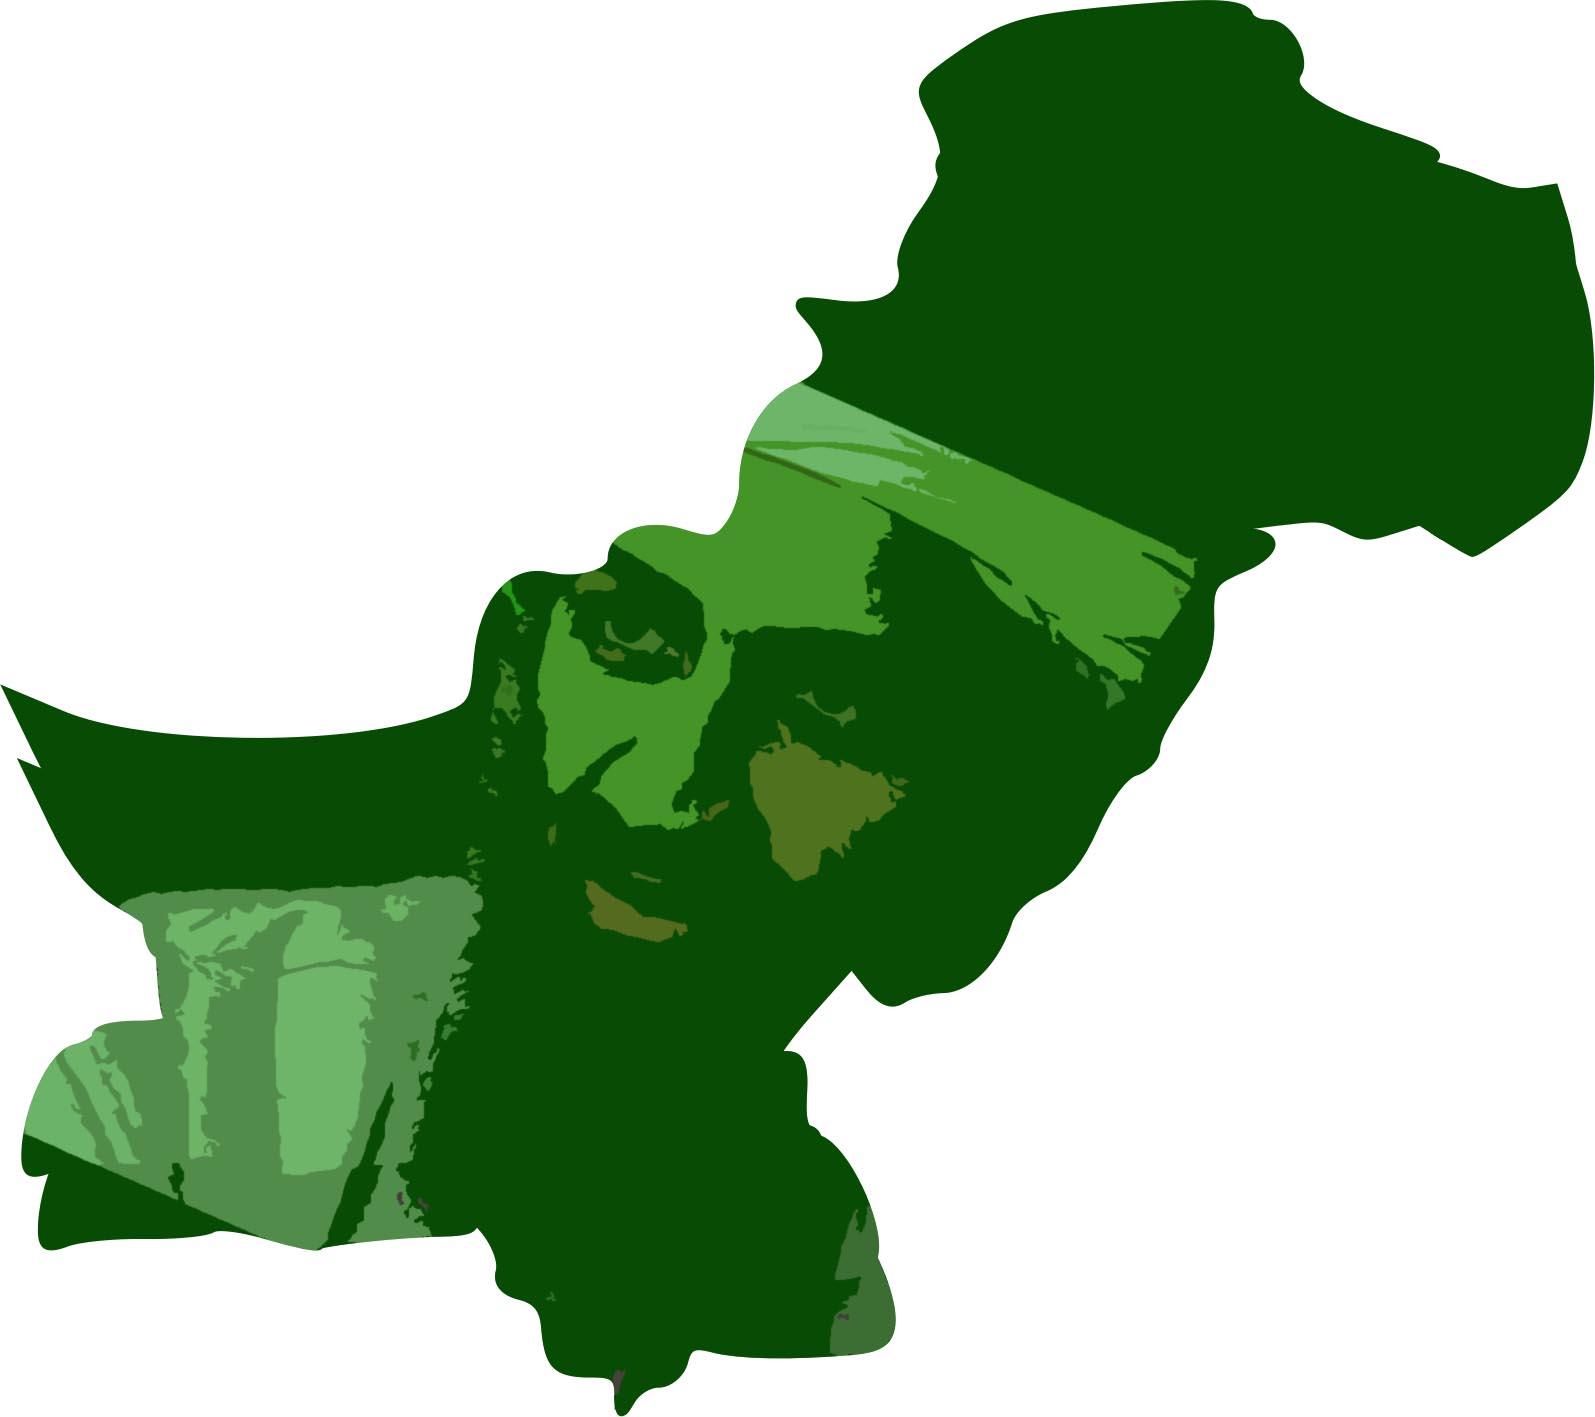 Pakistan_Osama